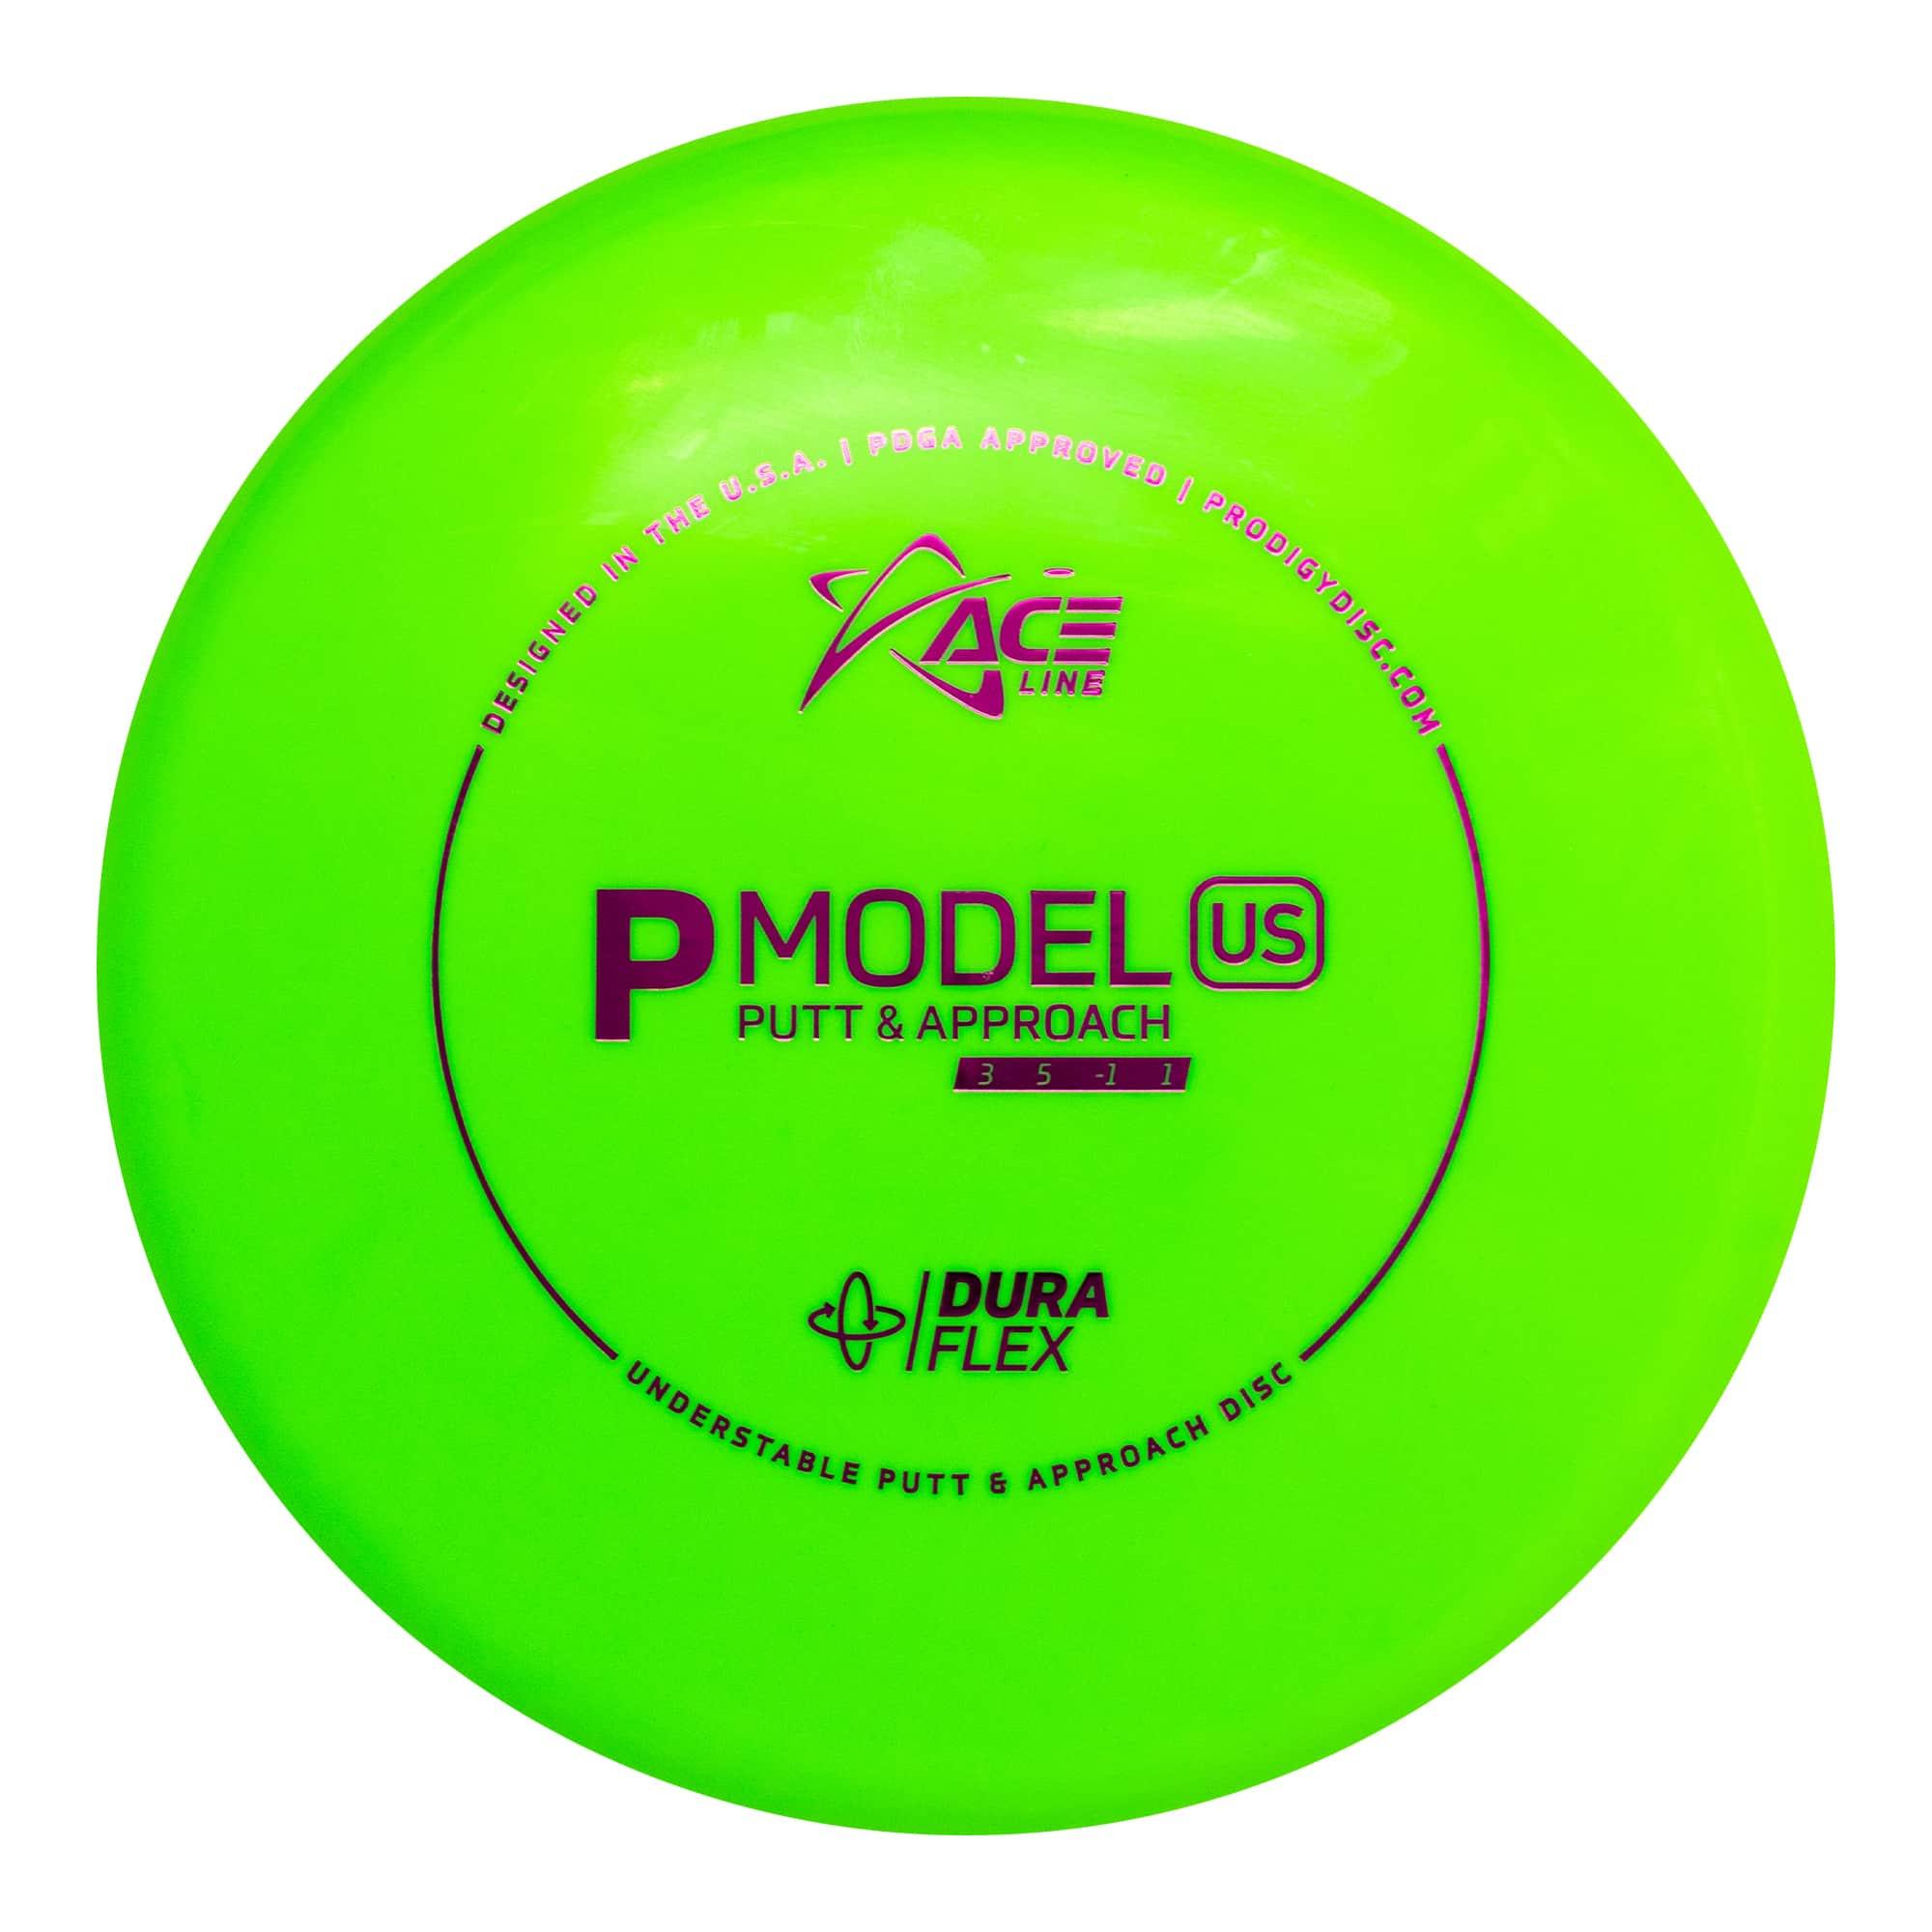 Prodigy Ace Line DuraFlex P Model US